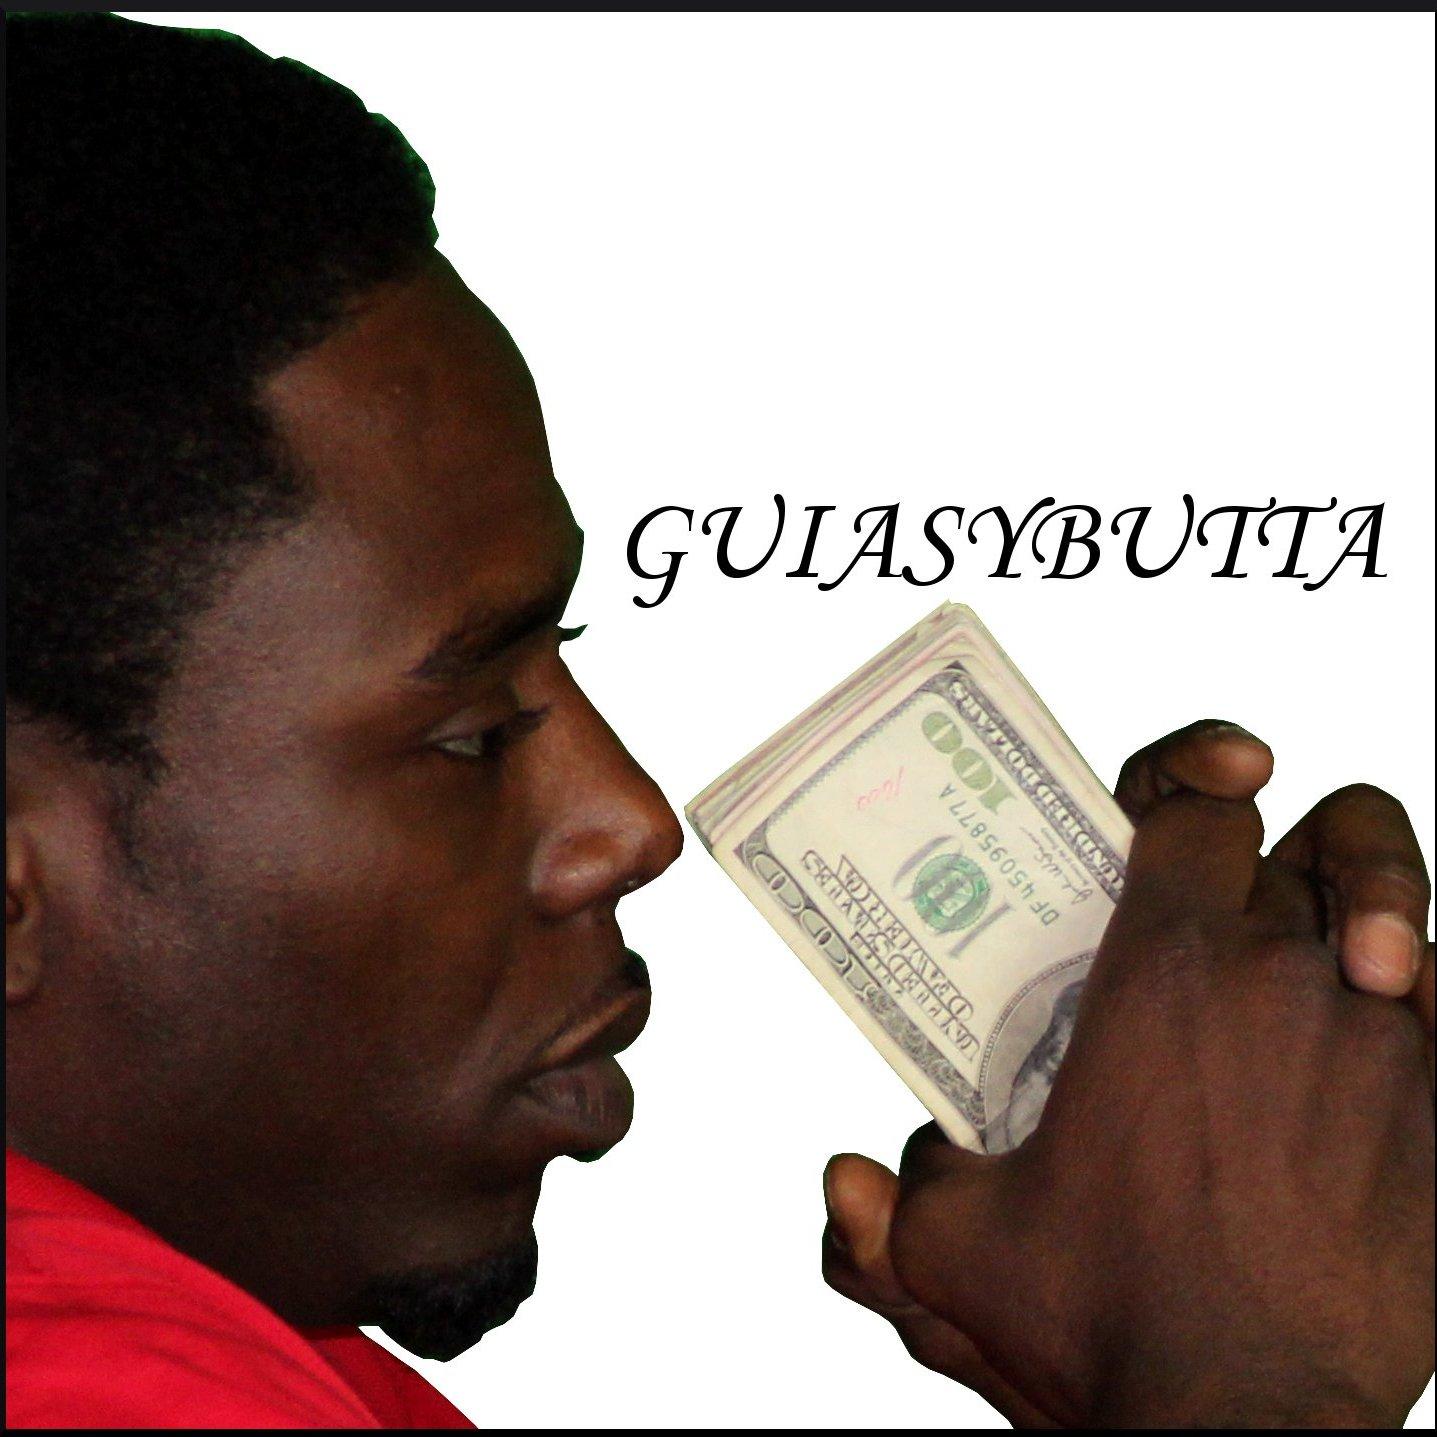 GuiasyButta